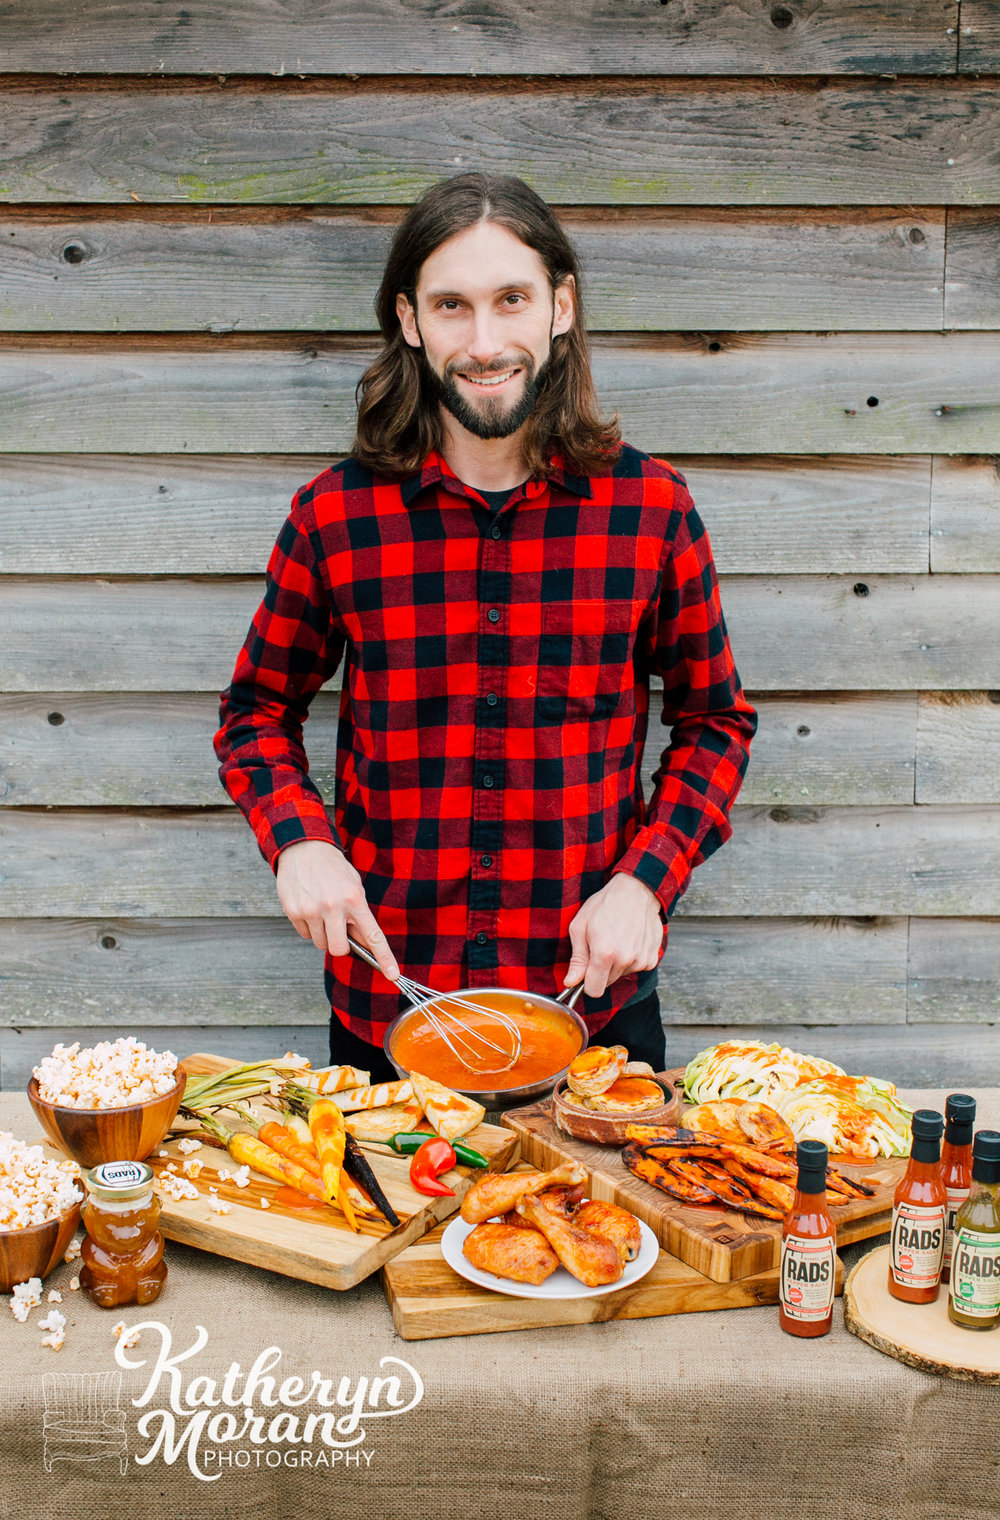 Bellingham Food Photographer, Food Stylist Katheryn Moran, RADS Hot Sauce